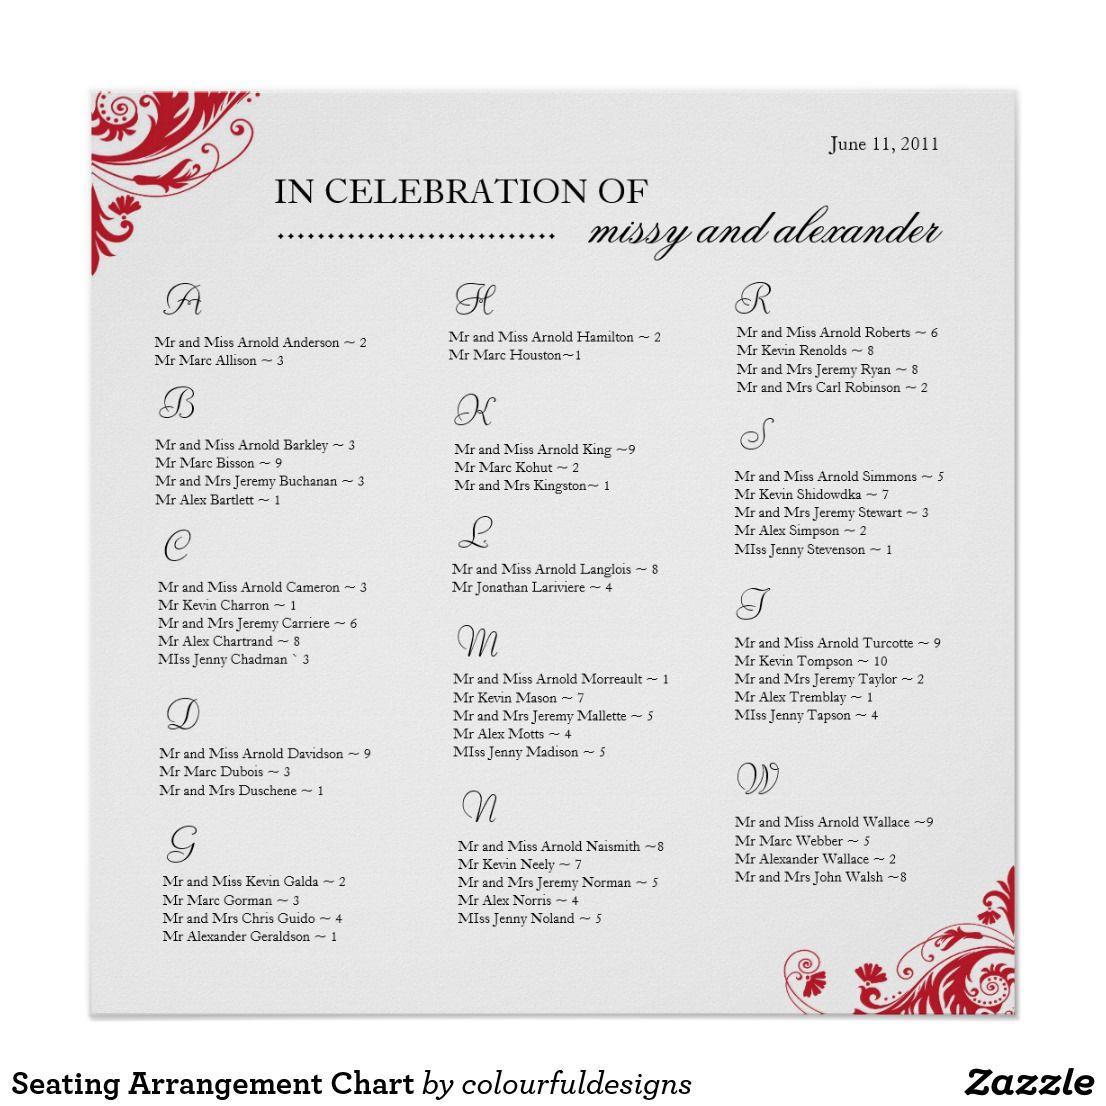 Seating Arrangement Chart | Zazzle.com